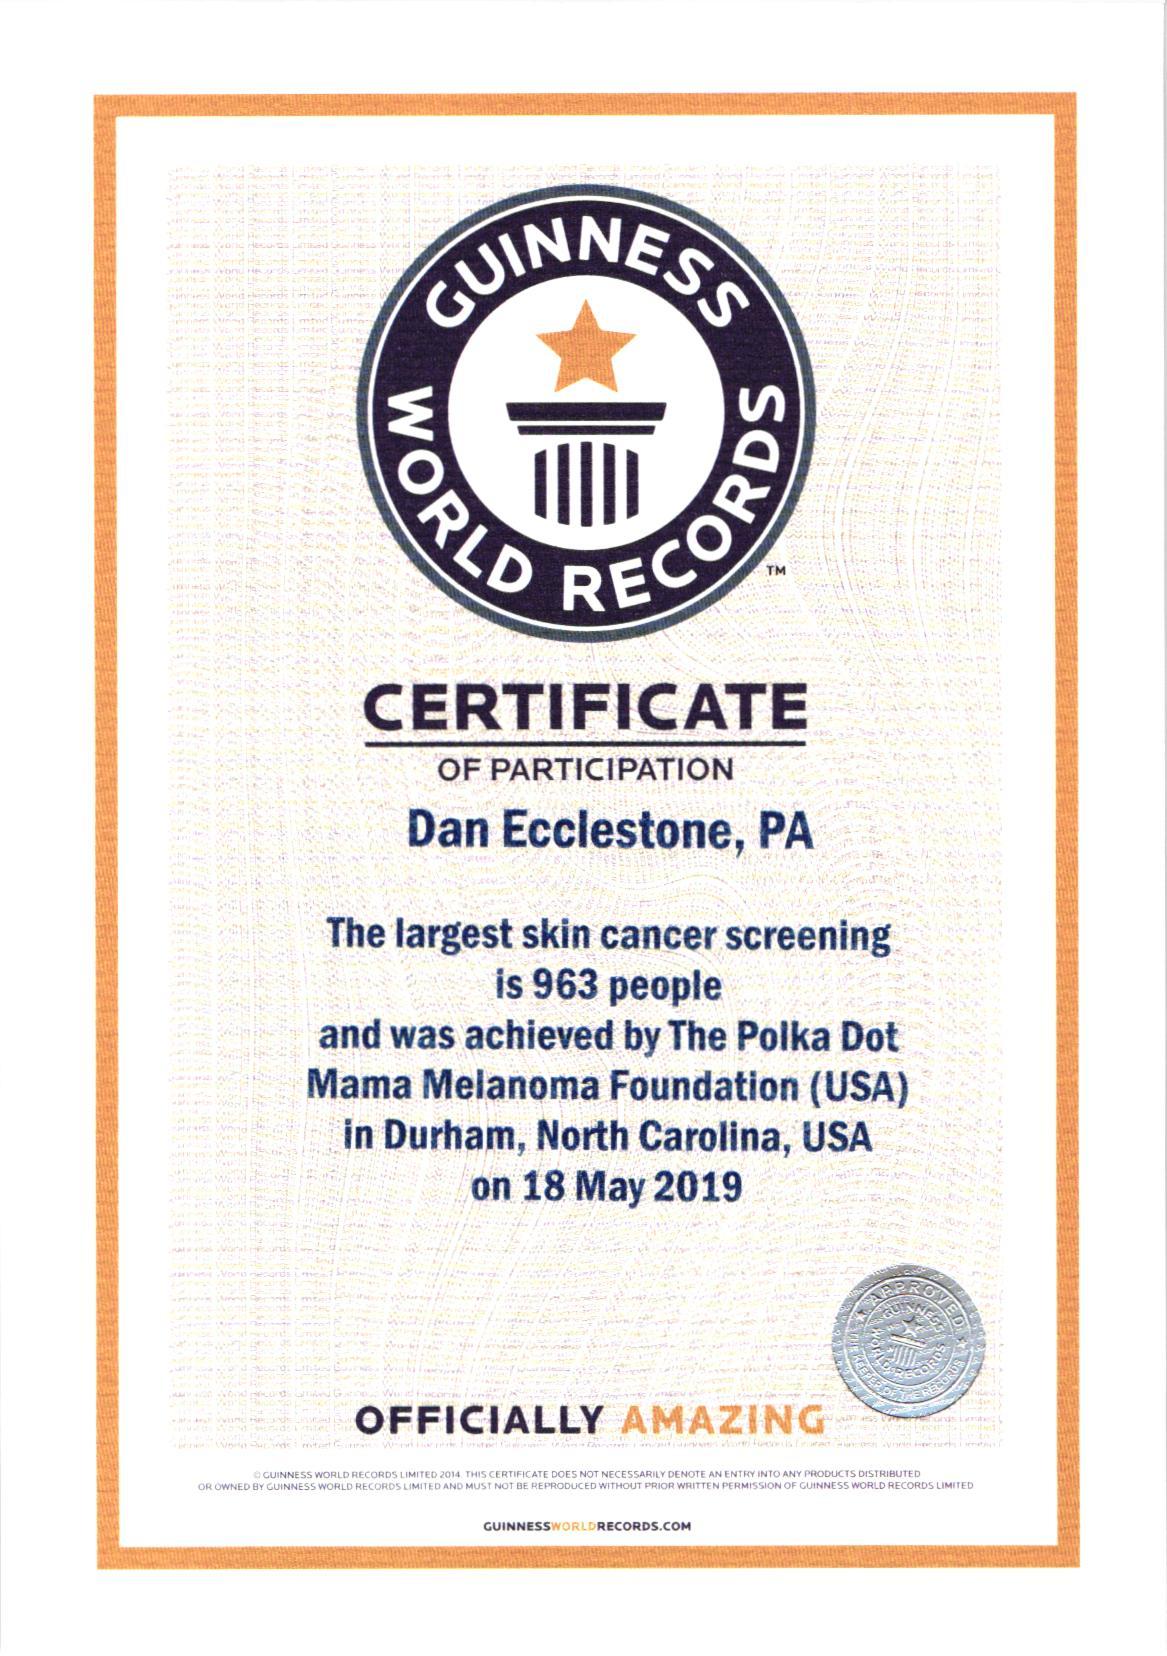 Guinness Certificate DE